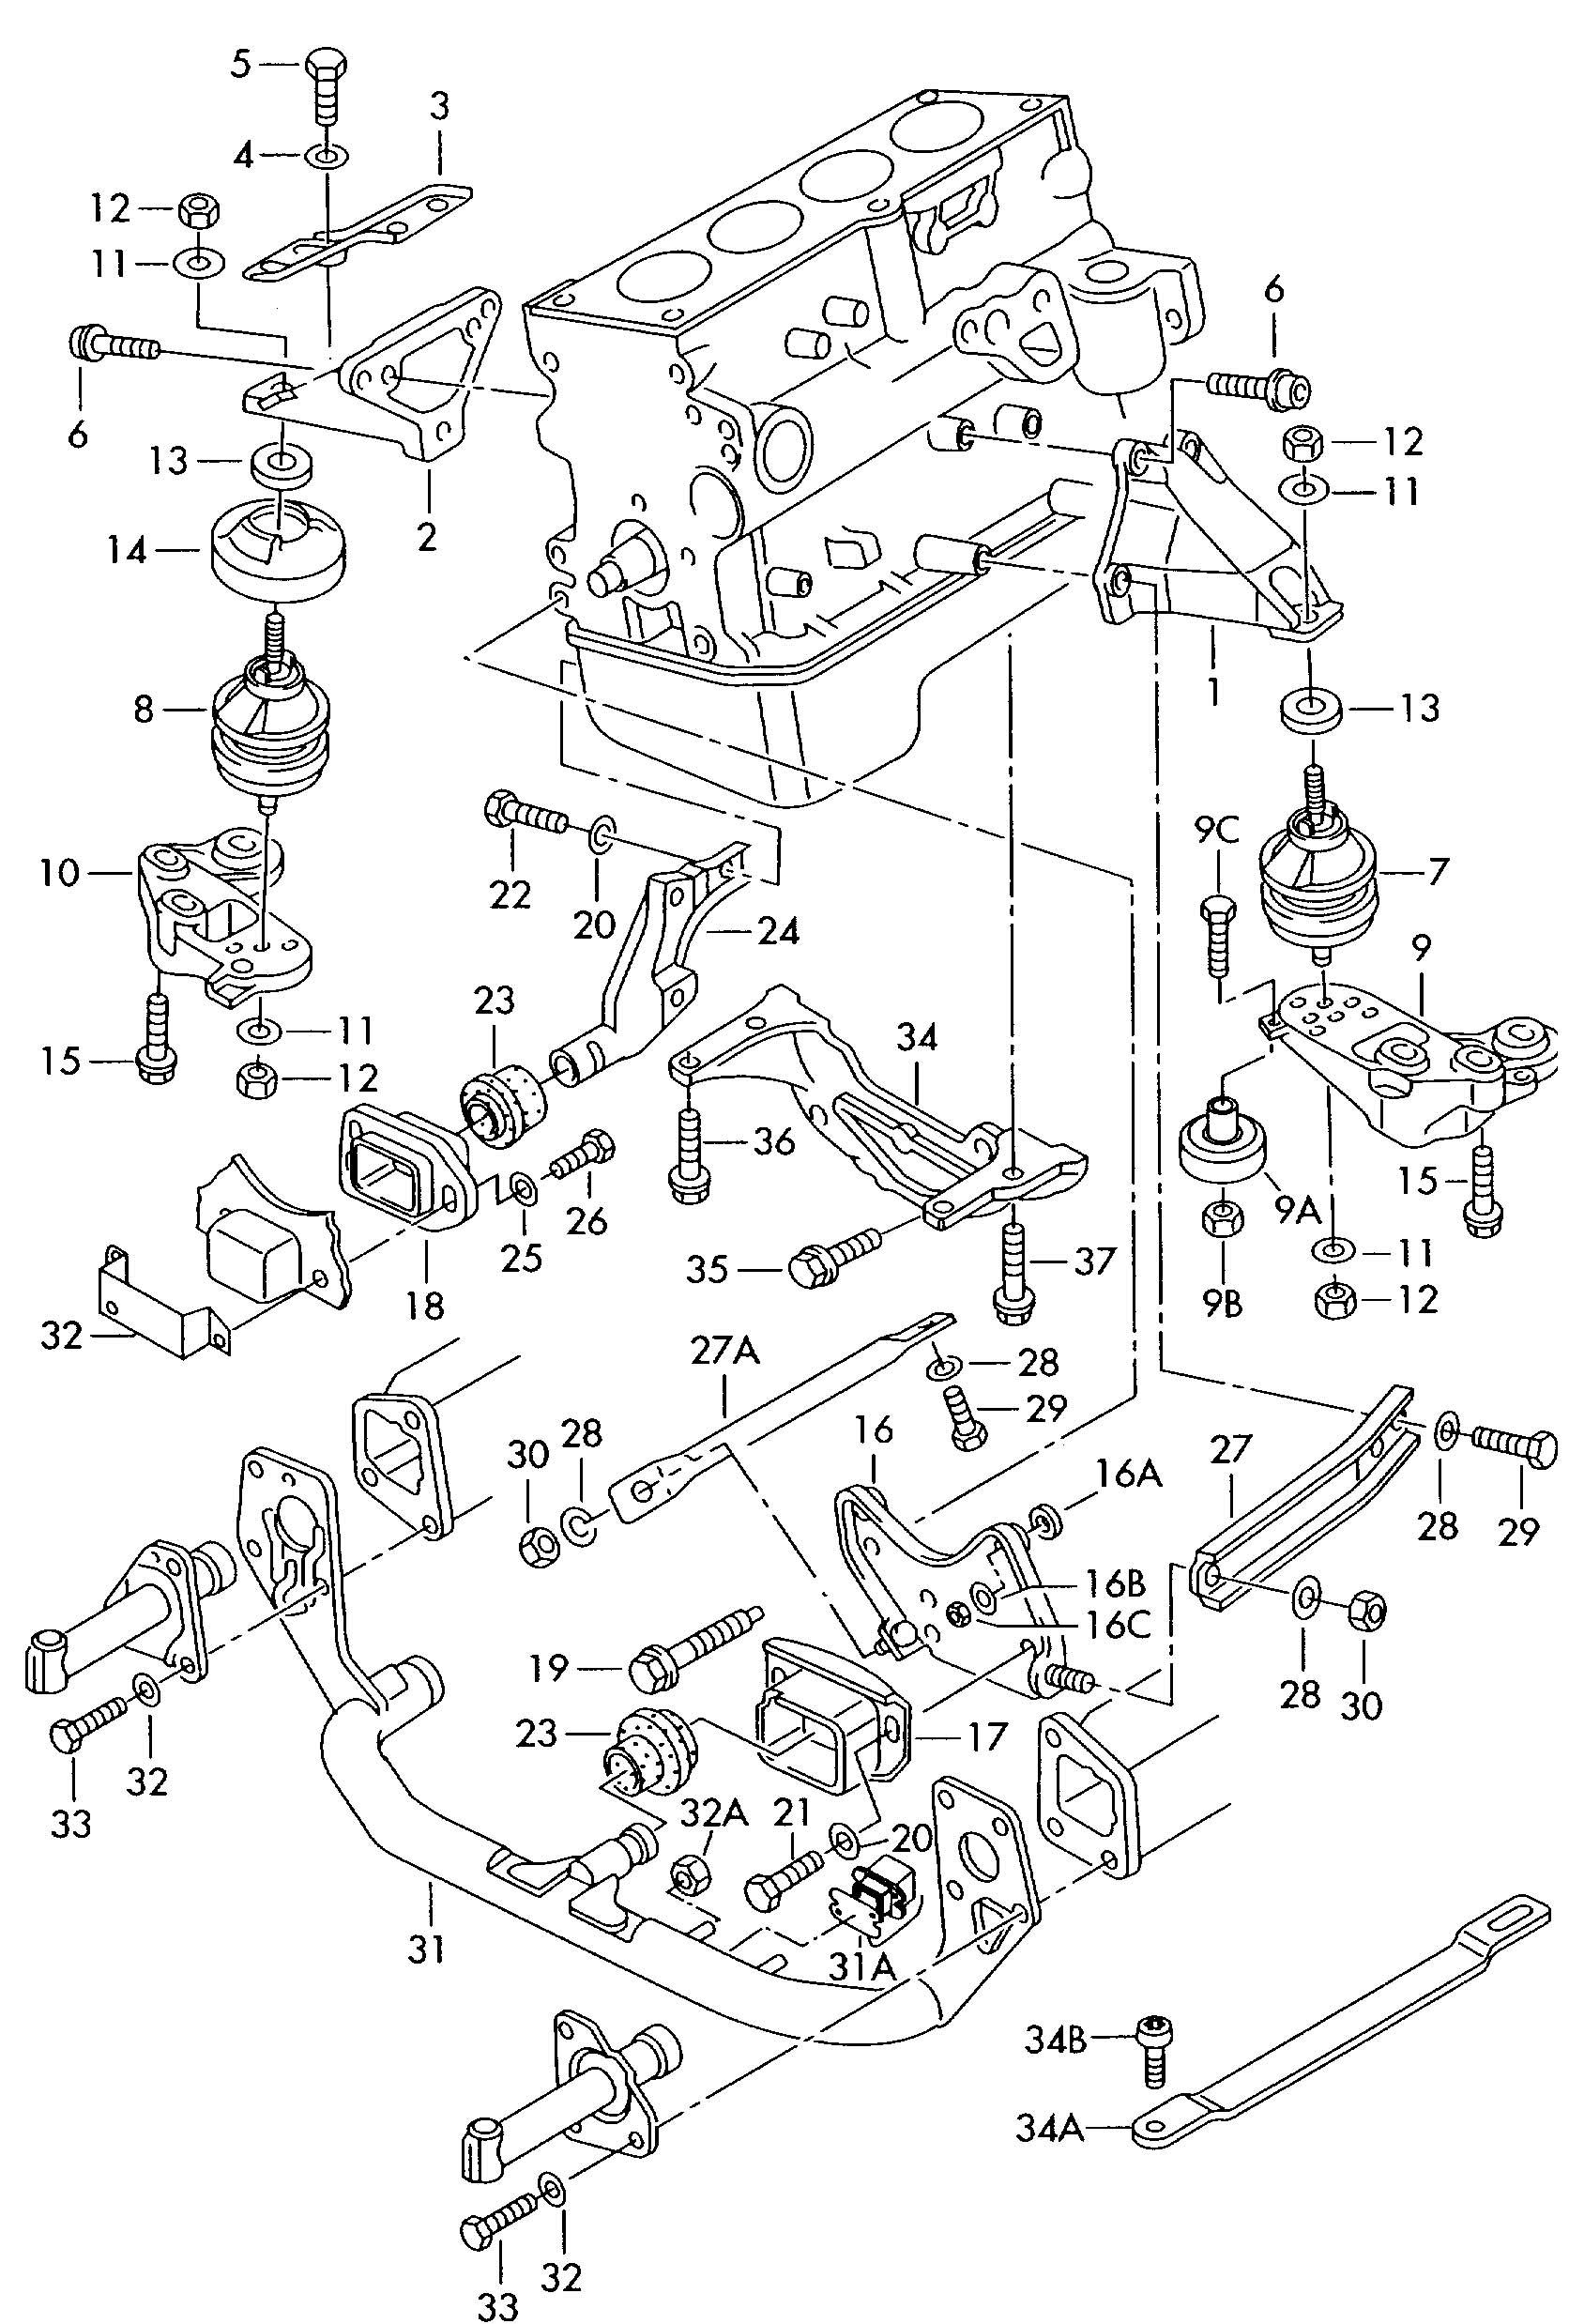 Volkswagen Passat 1 8l Turbo Securing Parts For Engine